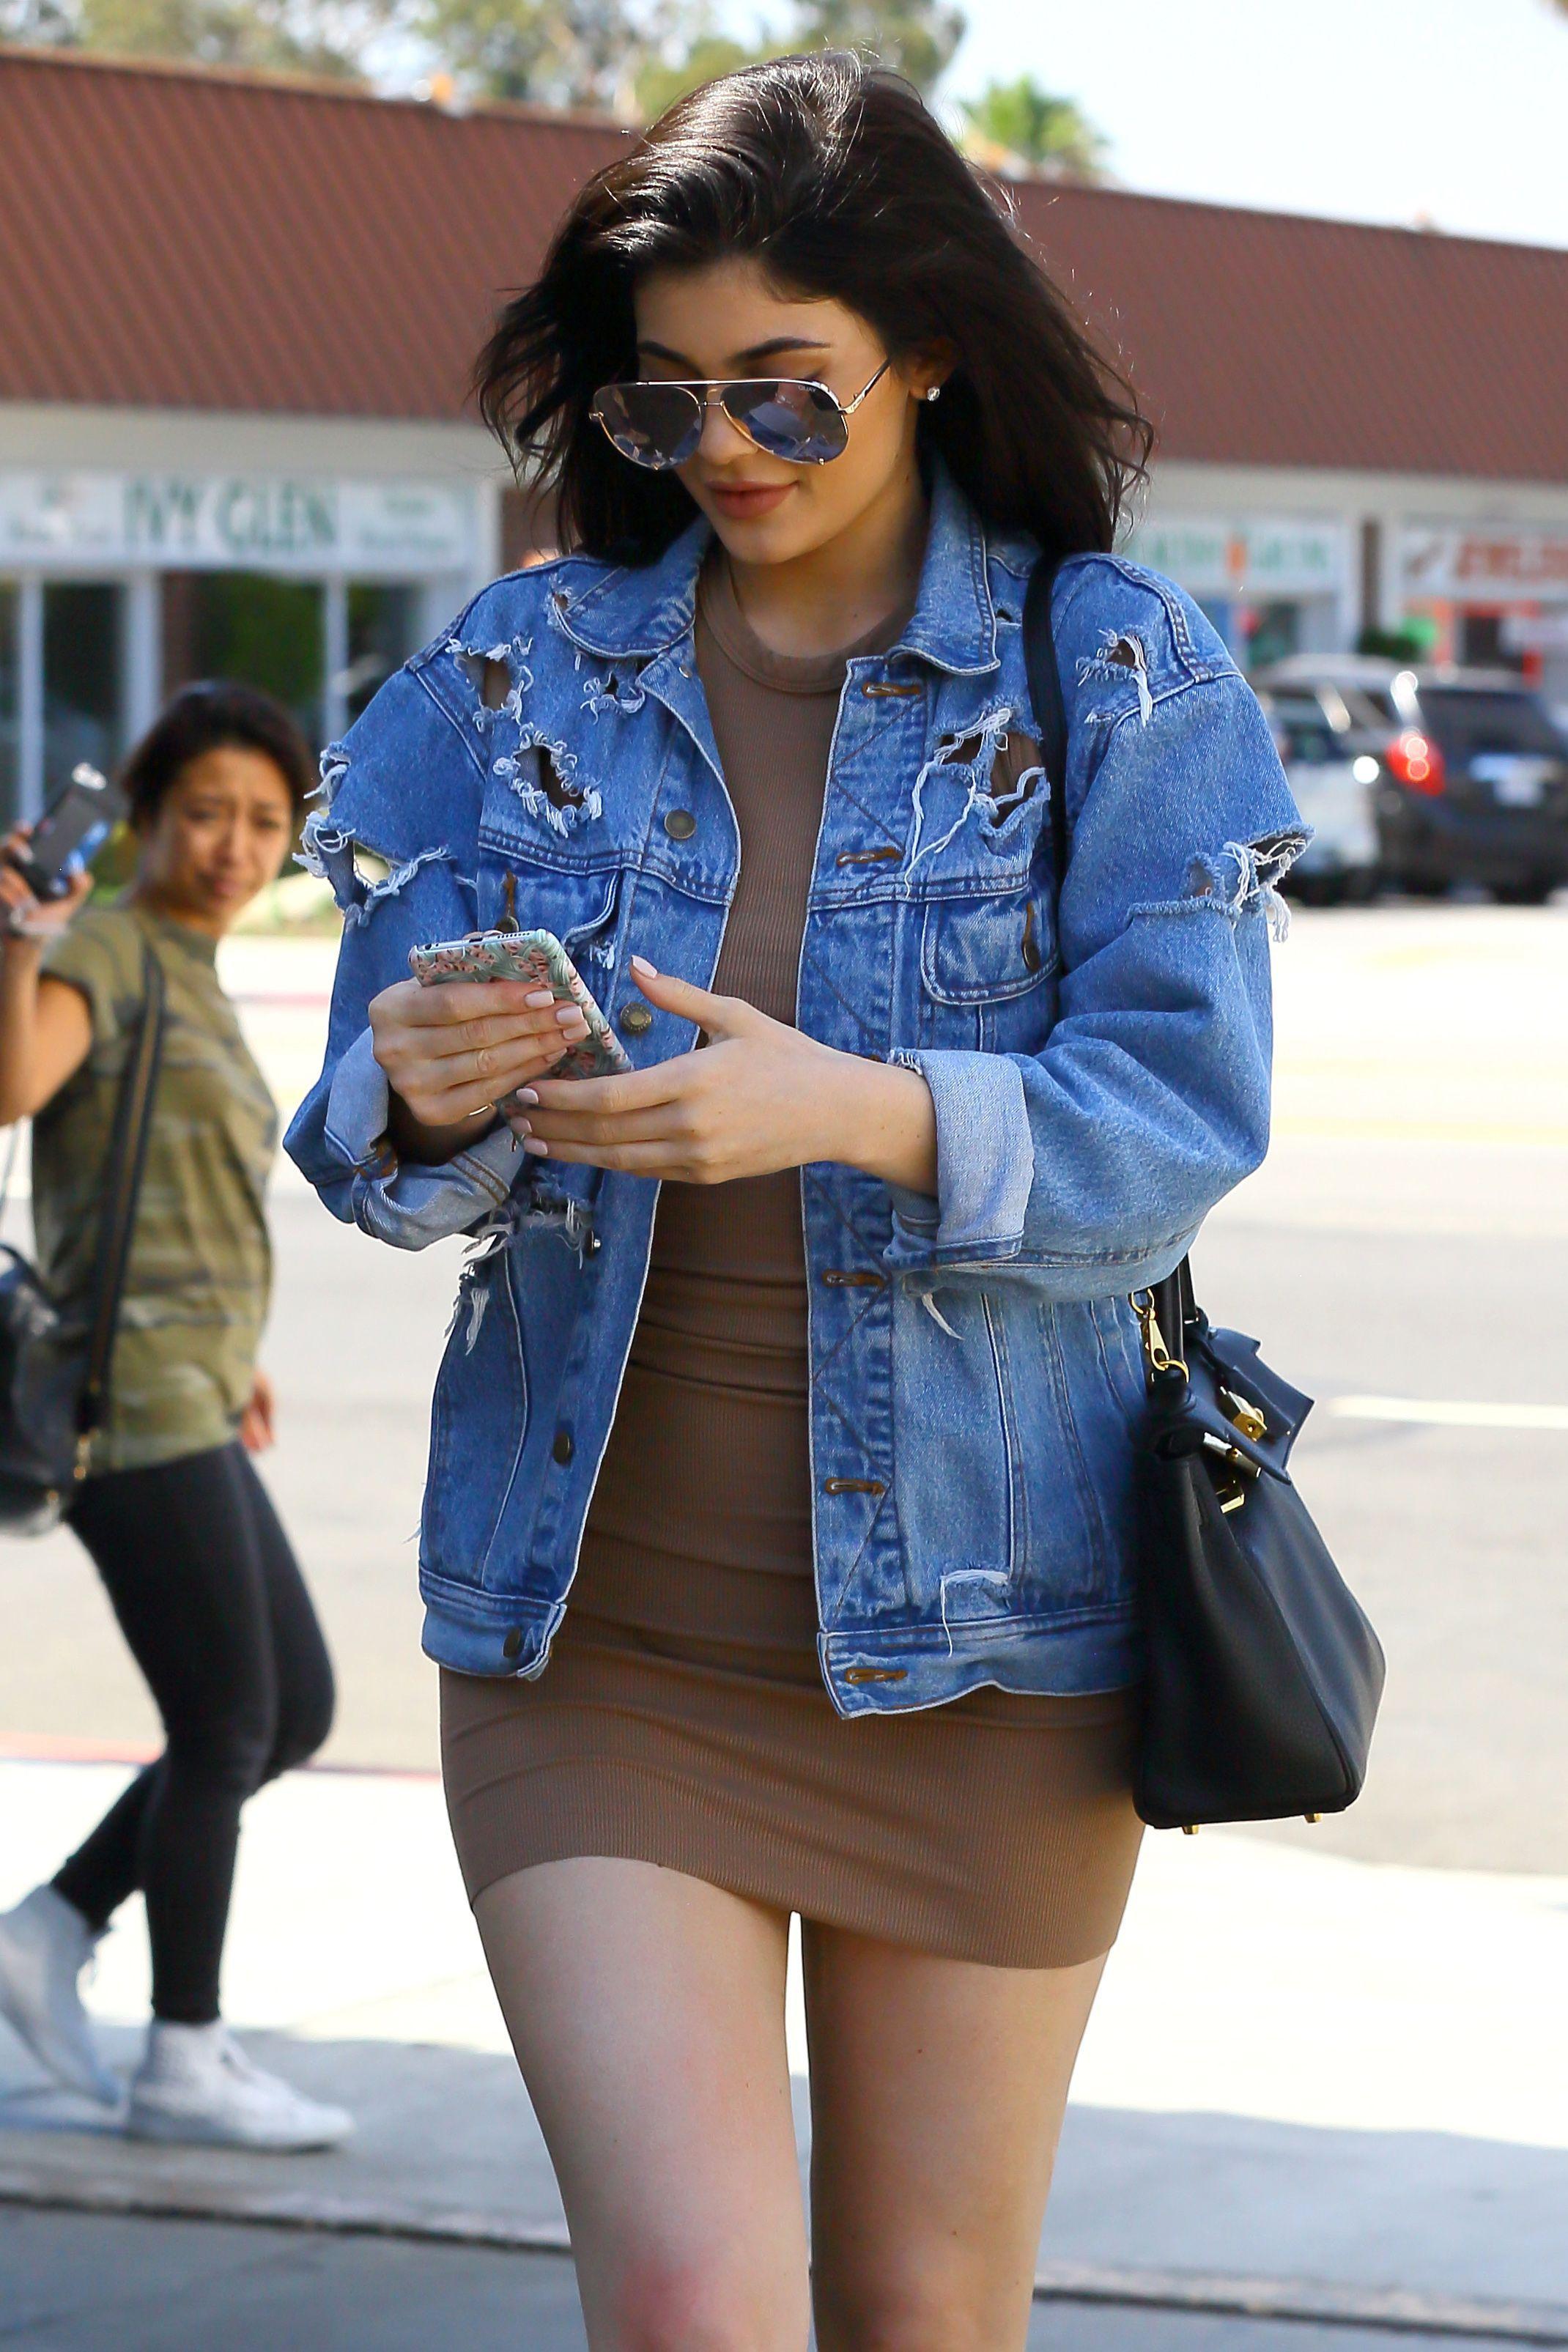 Elles La Veste RihannaBlake JennerComment LivelyKylie Portent deroCxBW